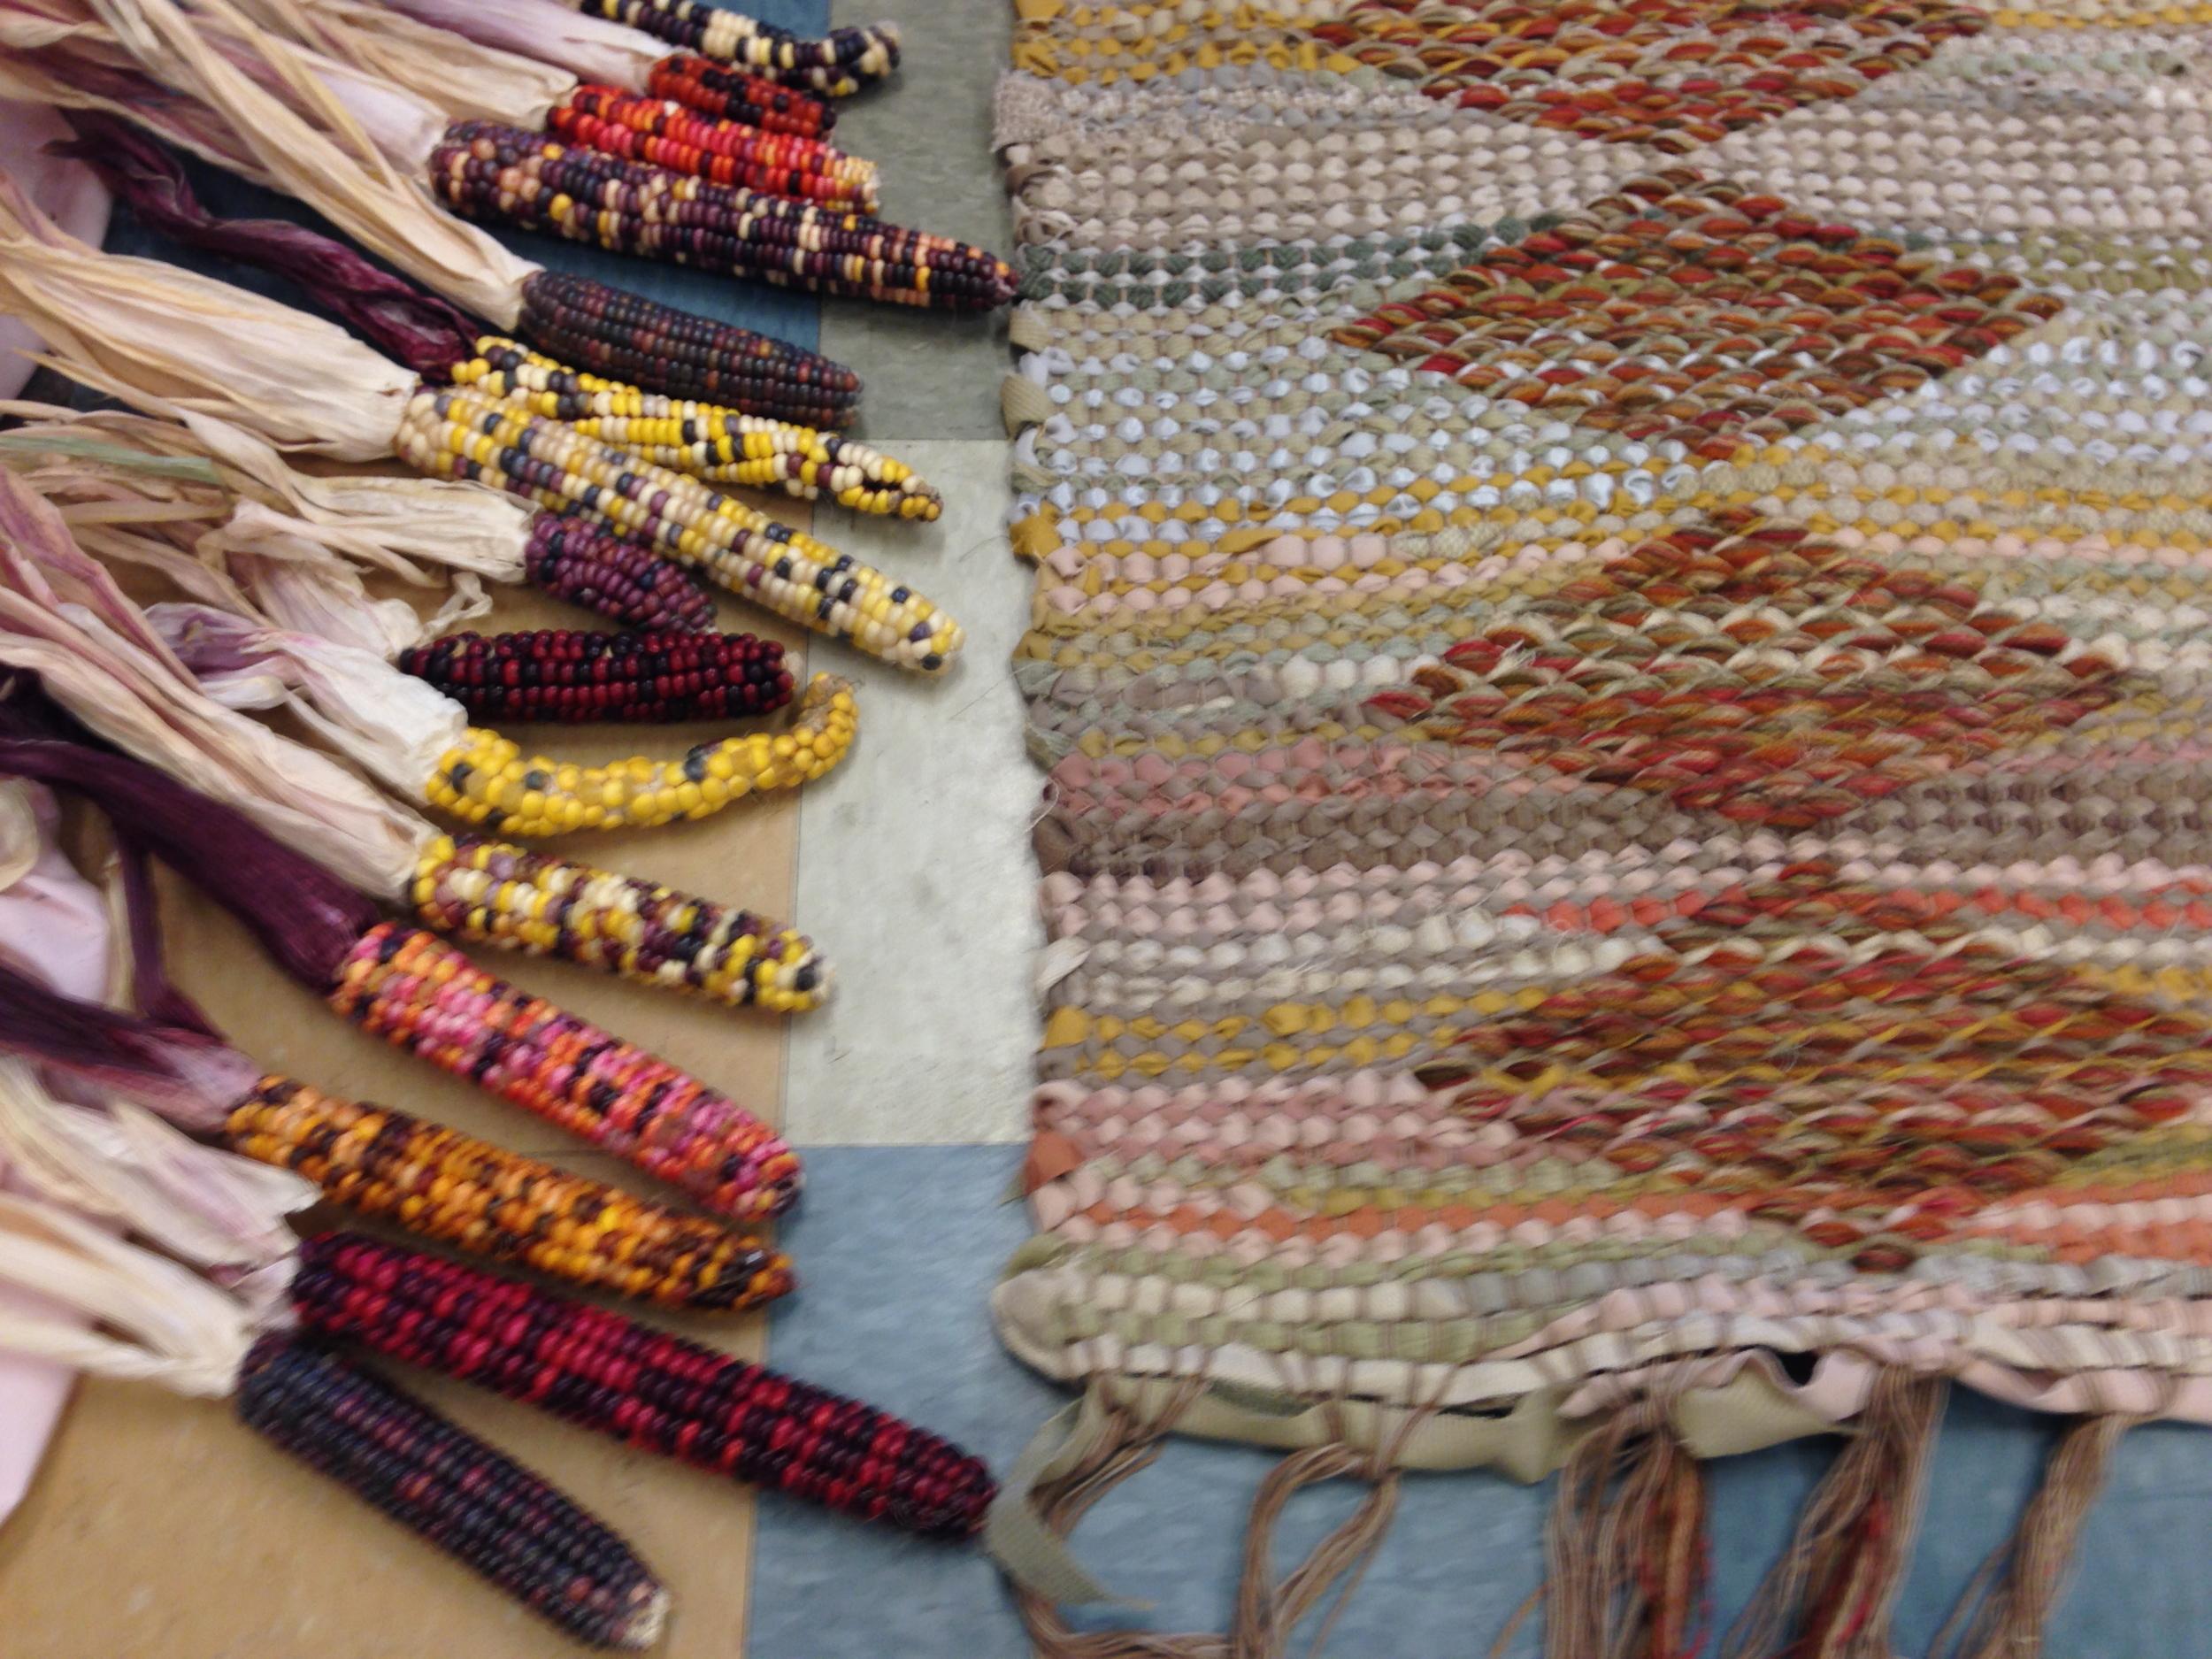 Corn varieties and Aurora's rug.